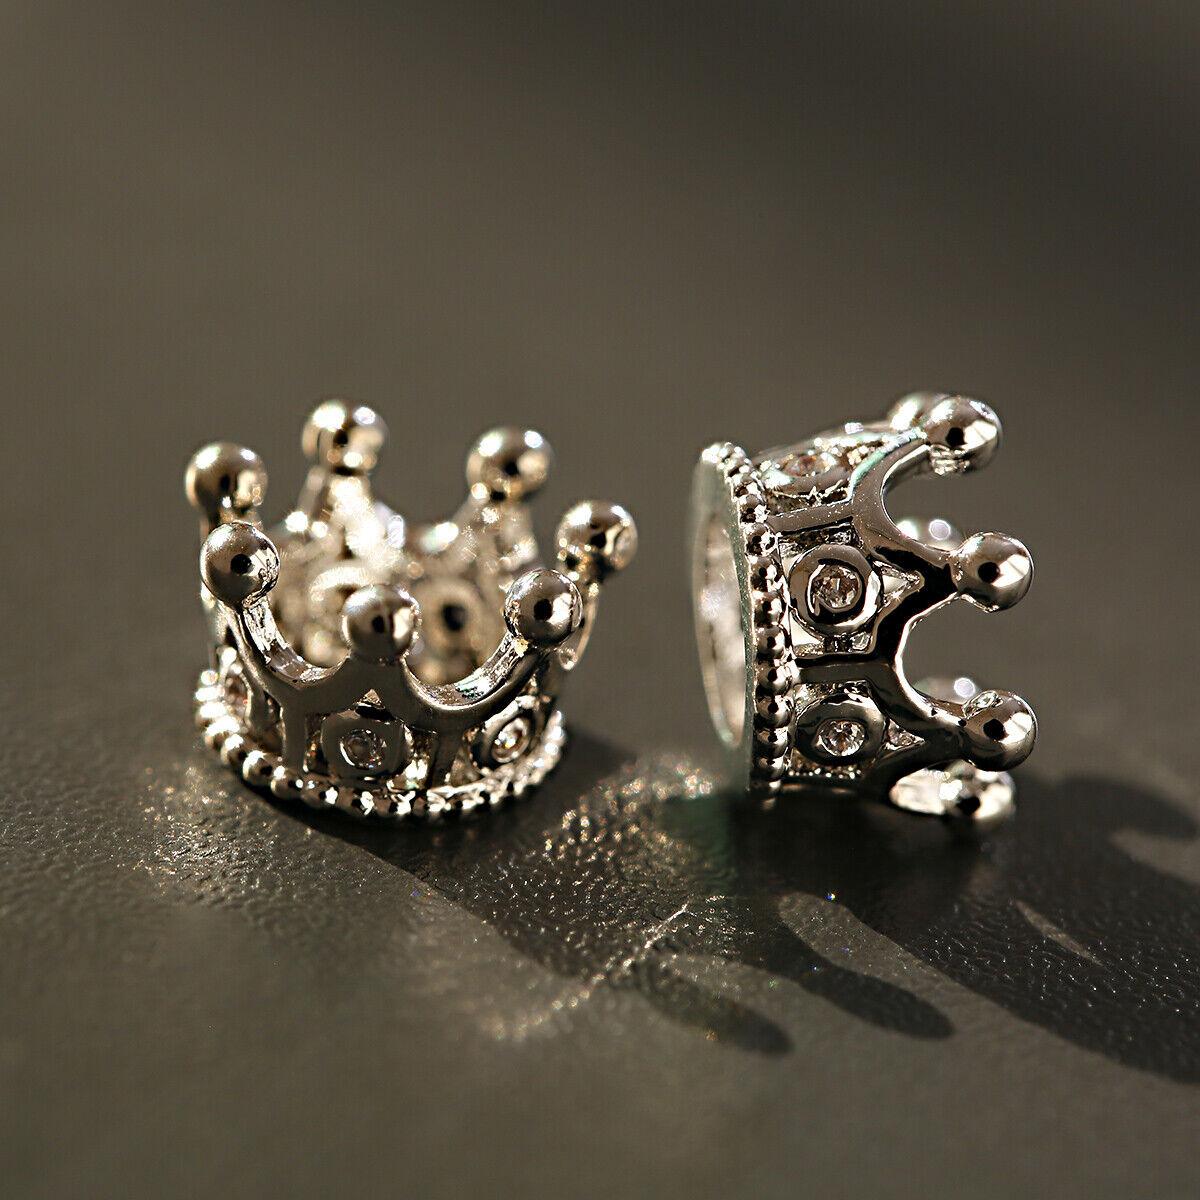 Zircon Gemstones Pave Queen Crown Bracelet Brass Copper Connector Charm Beads 7